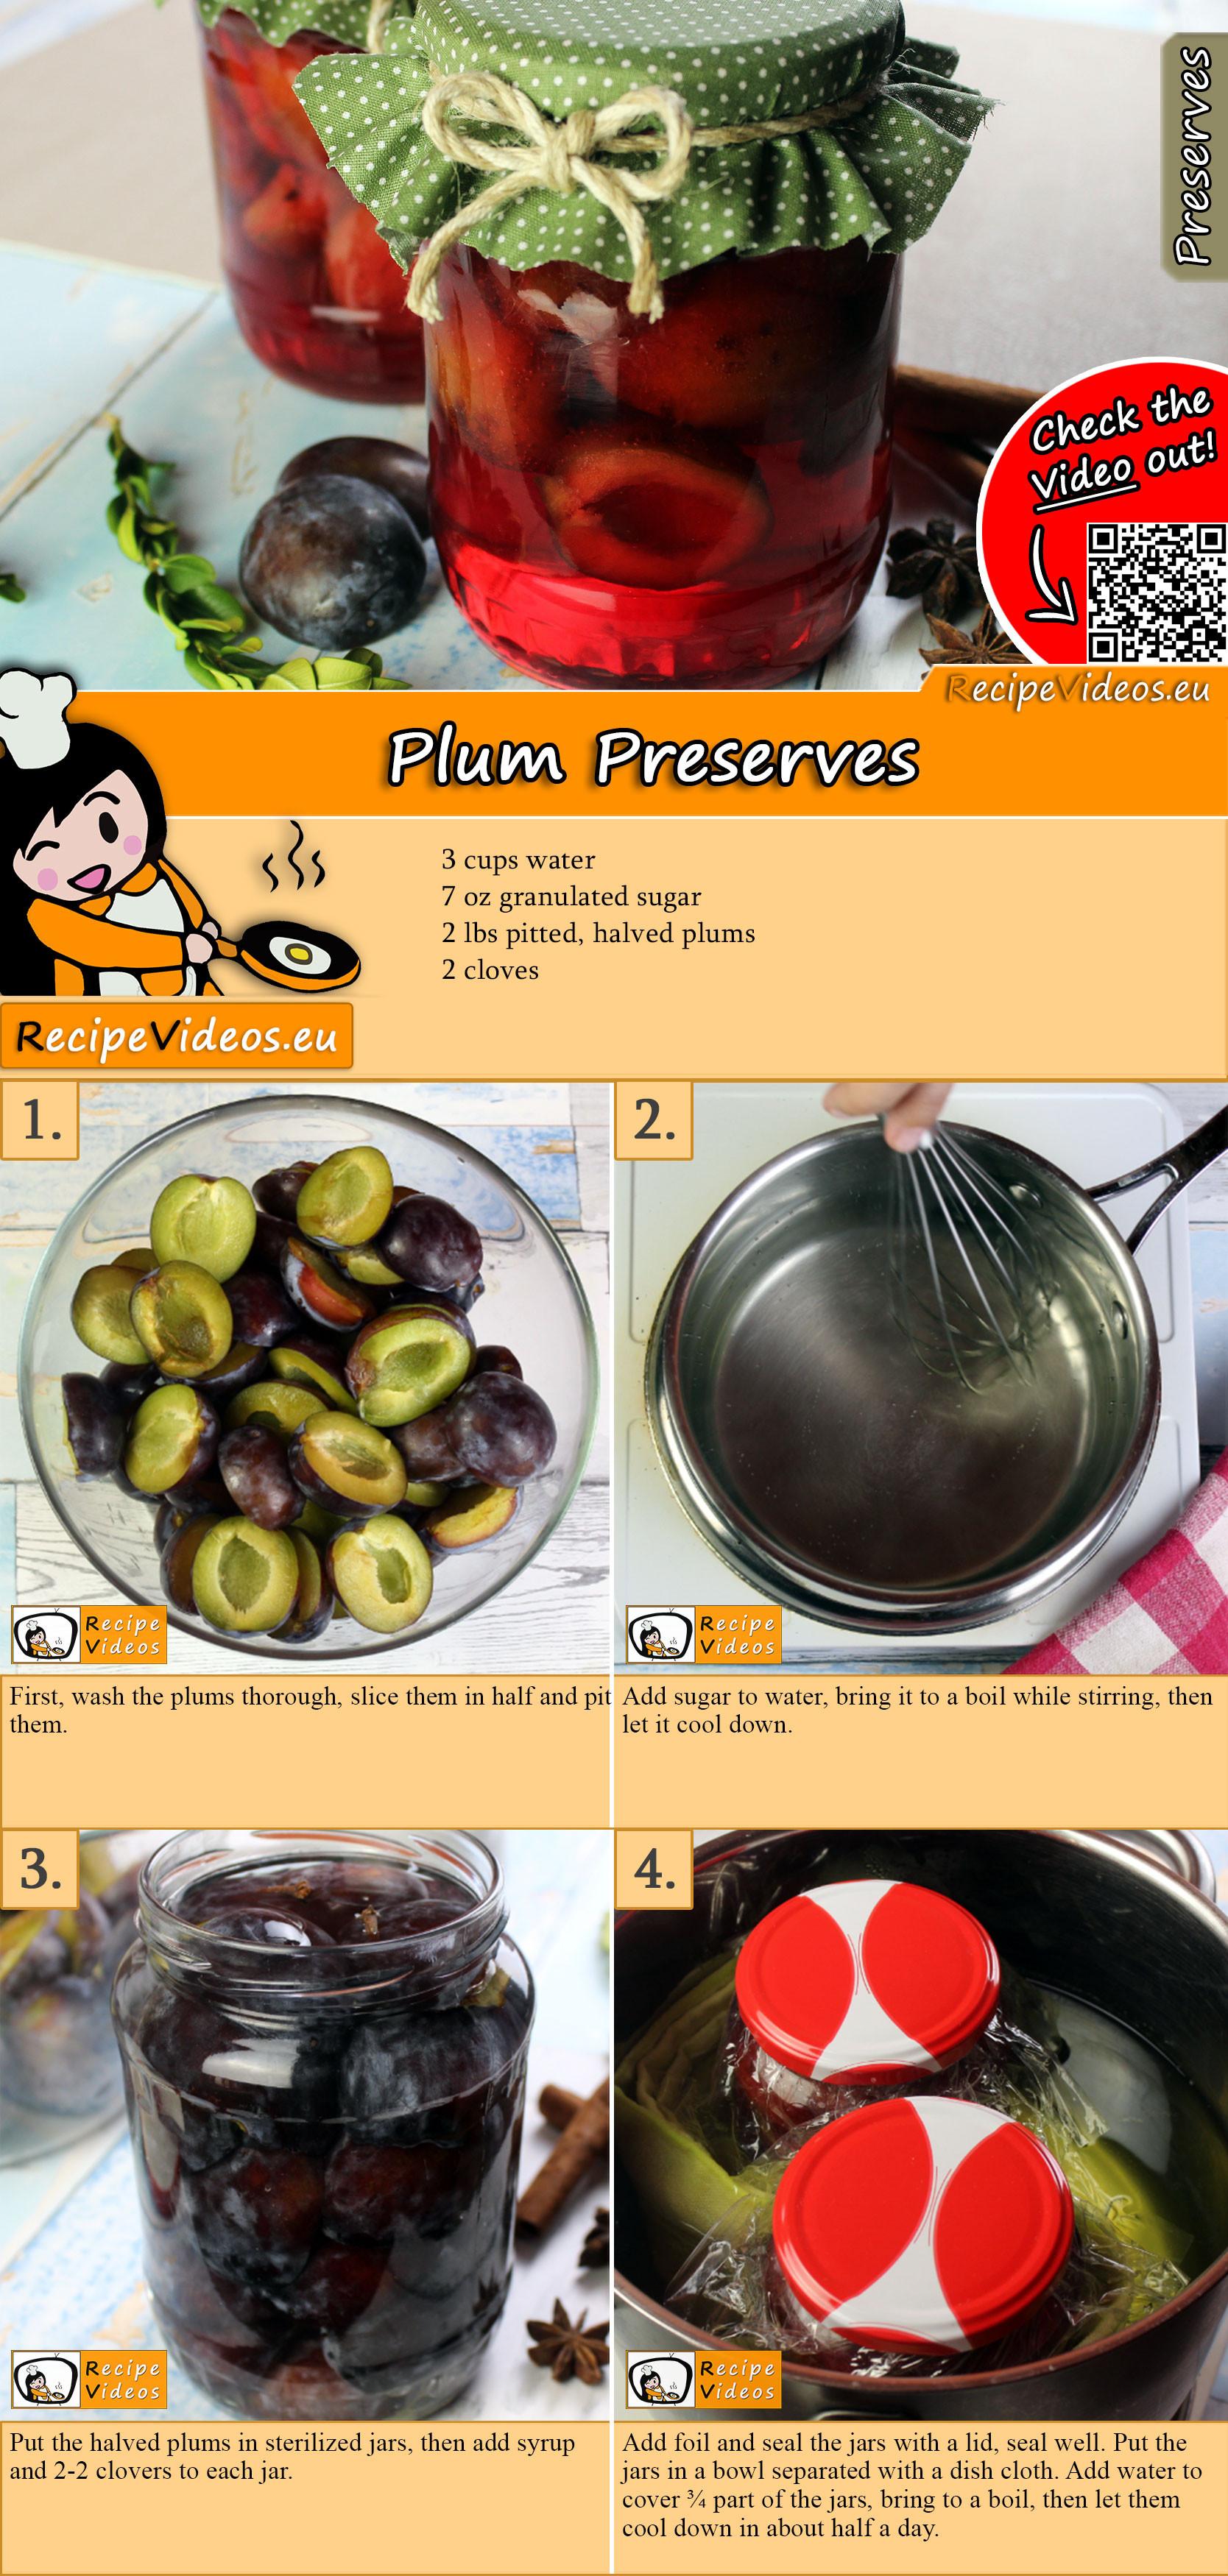 Plum Preserves recipe with video